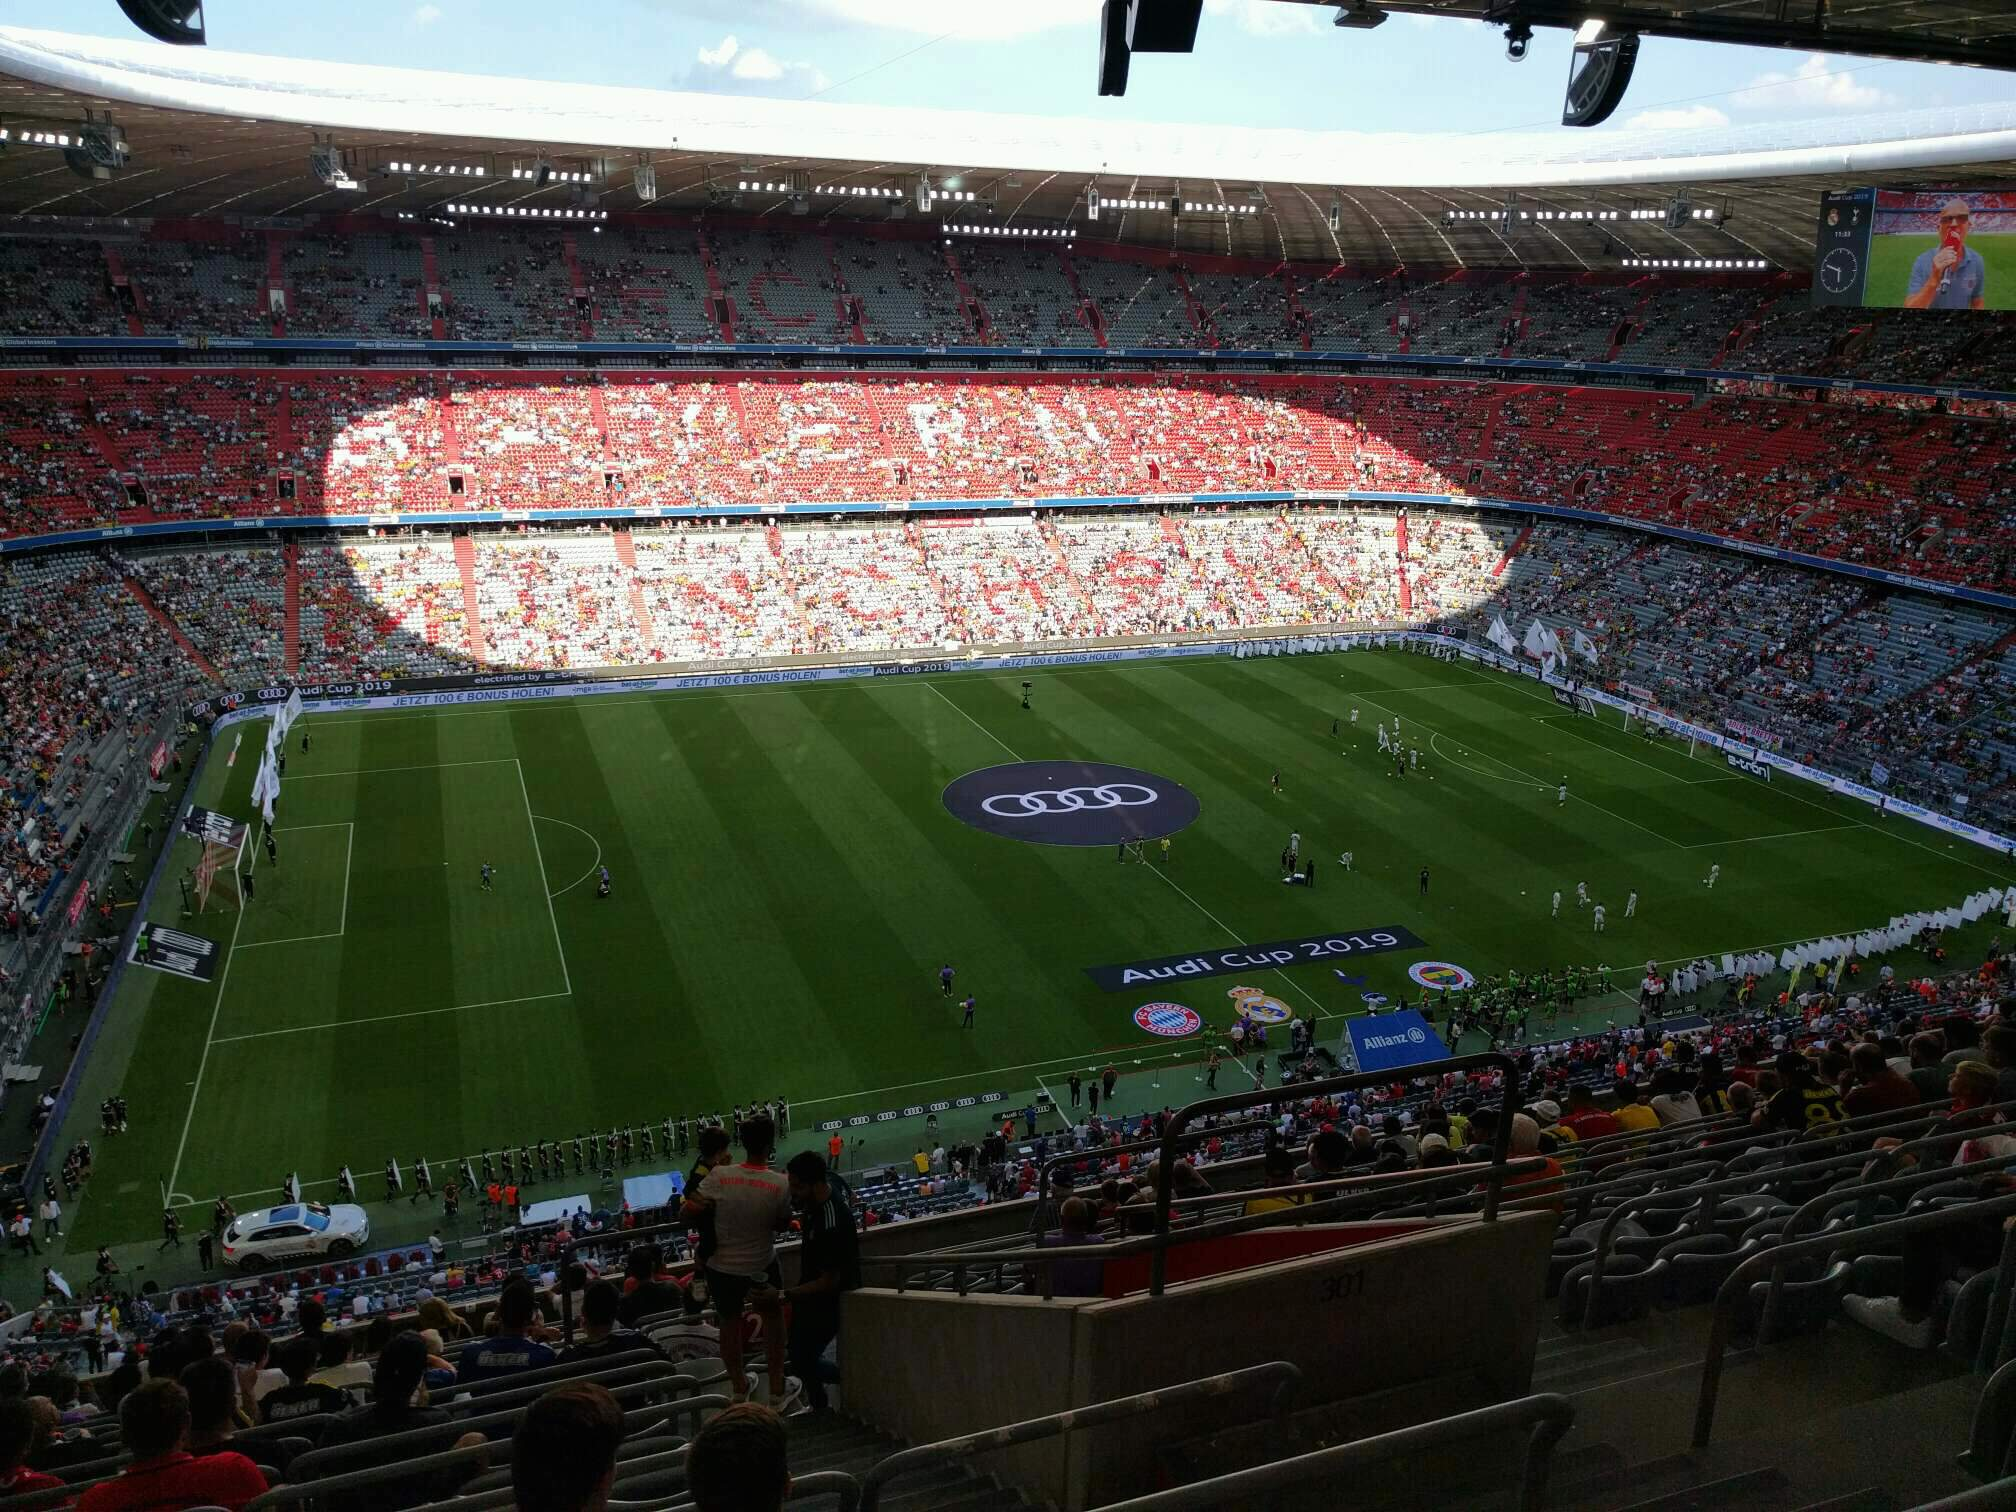 Allianz Arena Section 301 Row 15 Seat 11